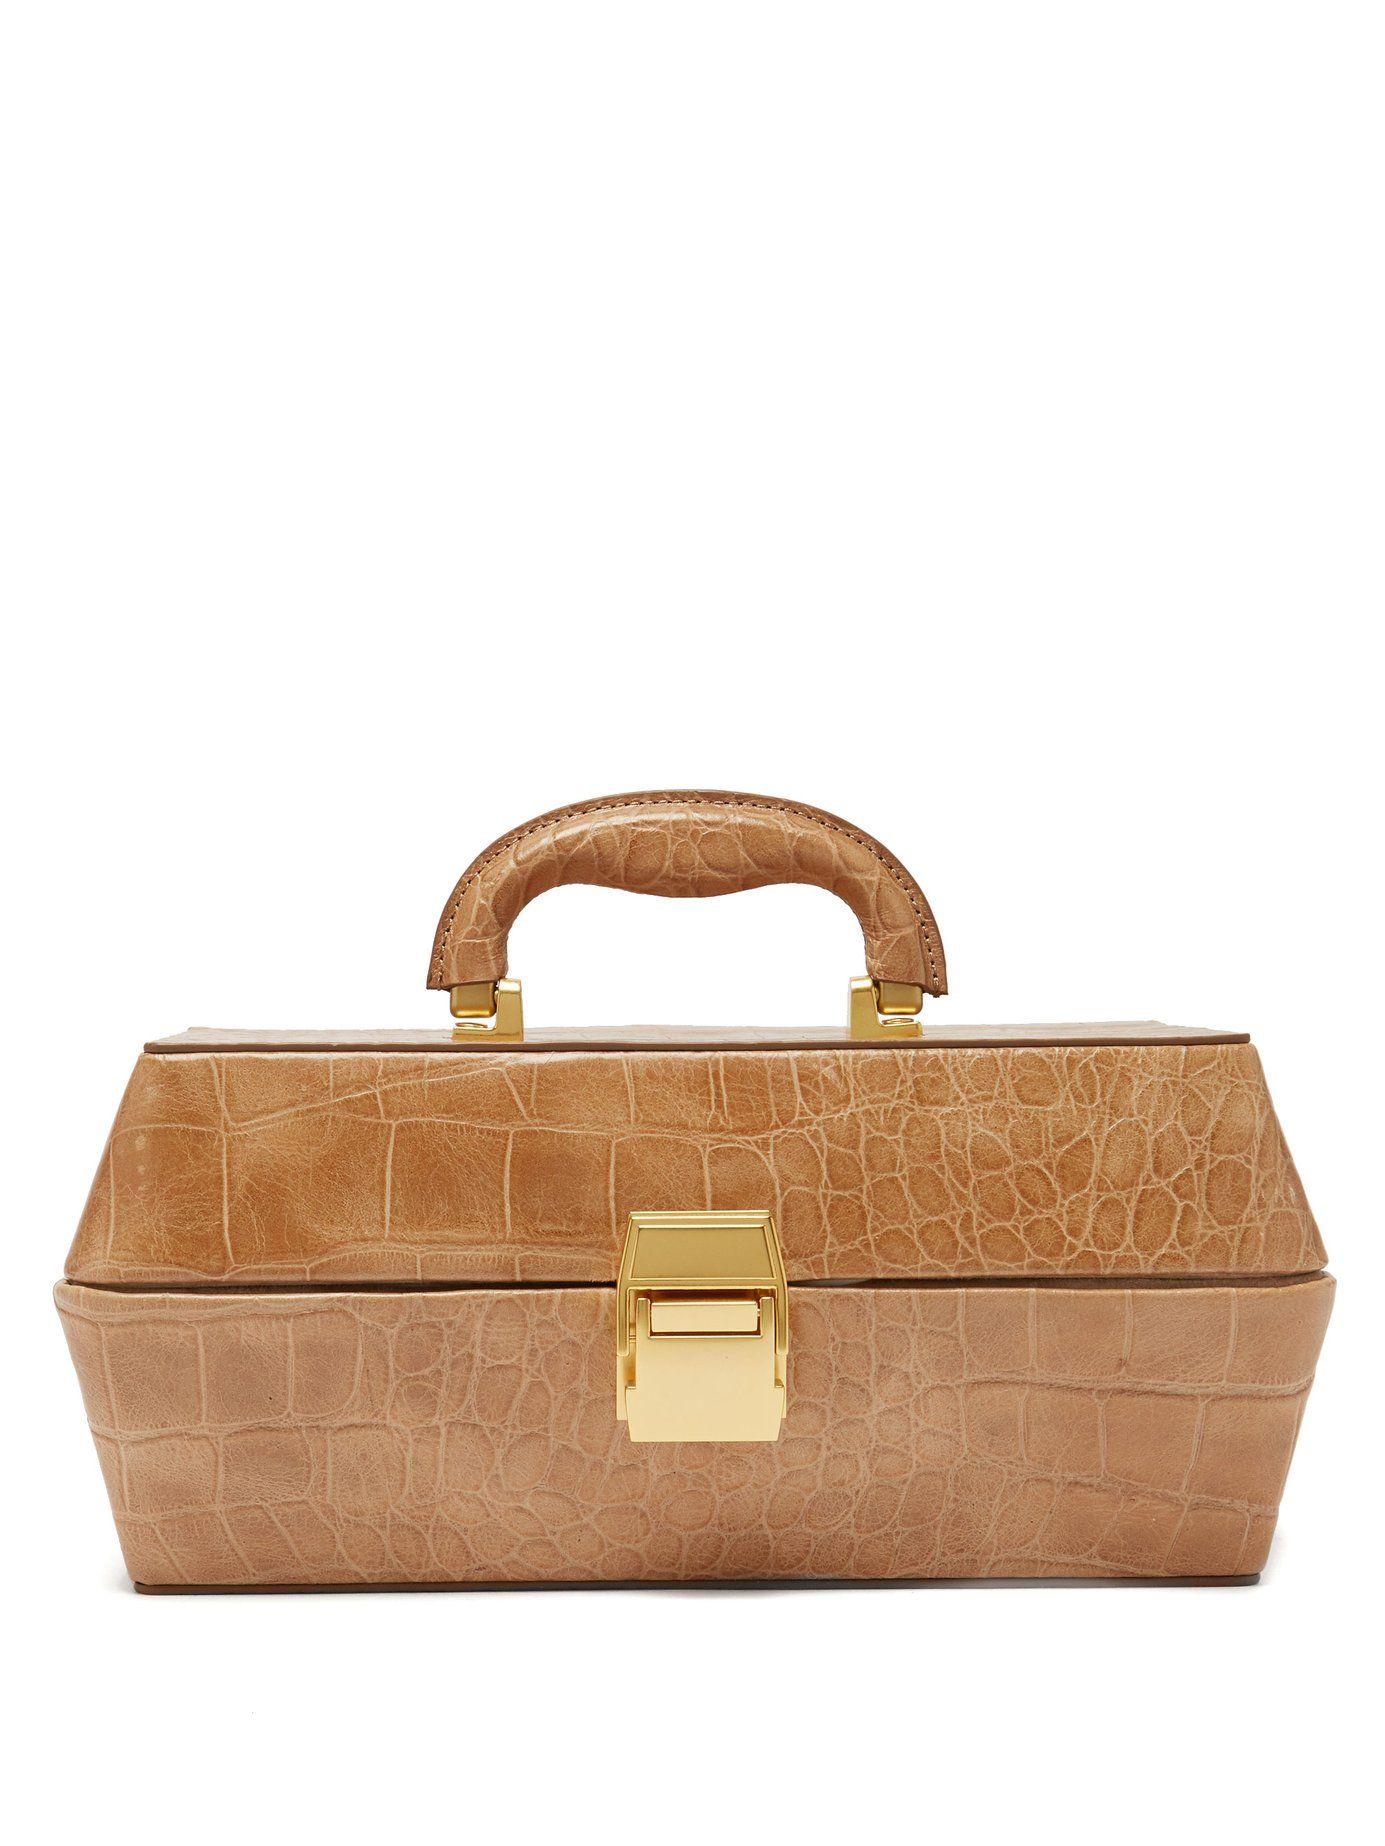 4f1ee9e706ae Lincoln crocodile-effect leather box bag